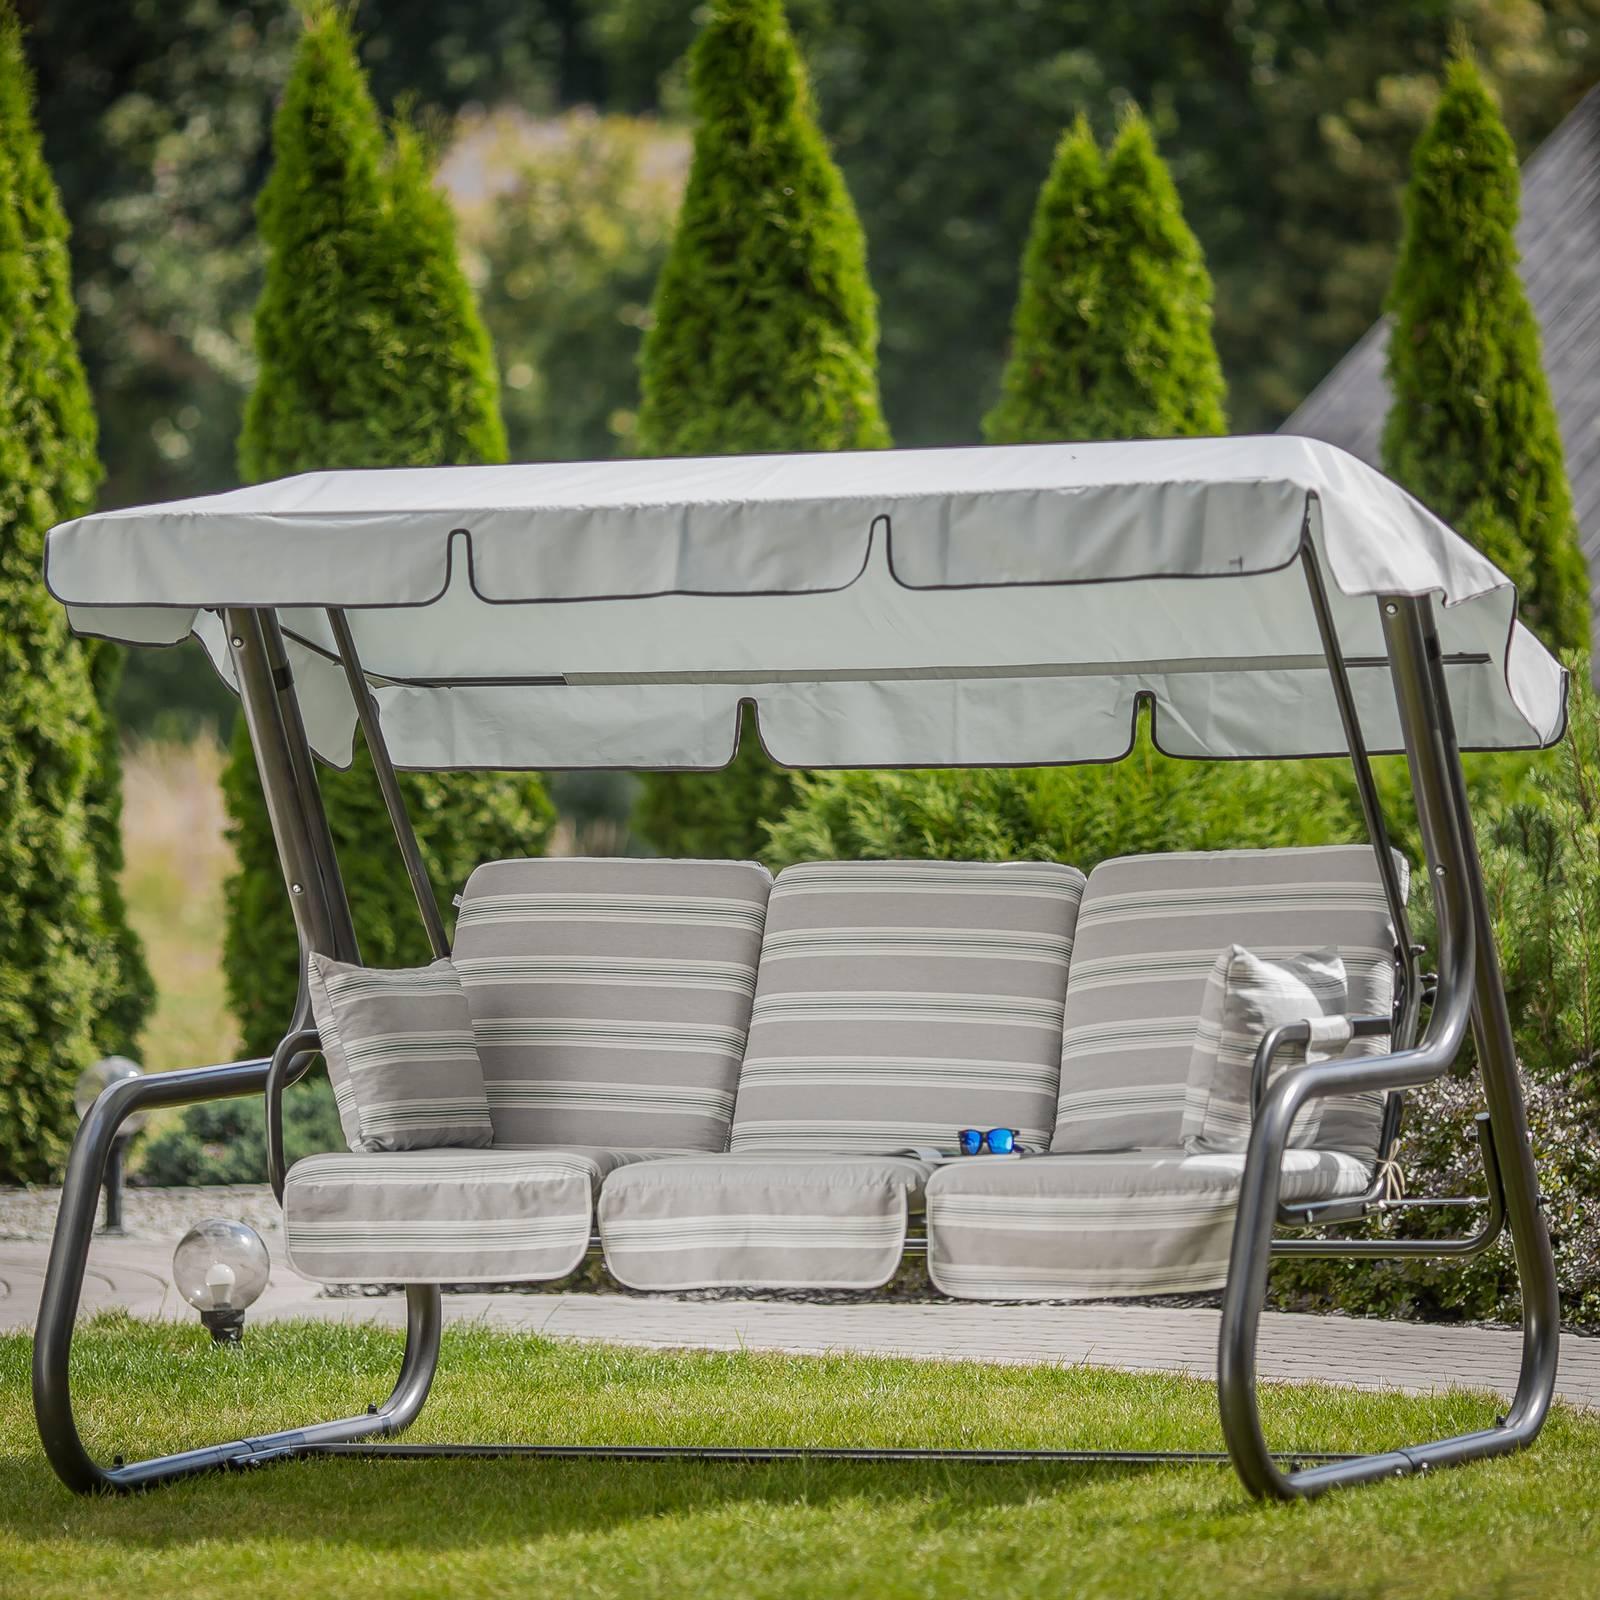 Replacement garden swing cushions 180 cm Rimini / Venezia C028-01PB PATIO